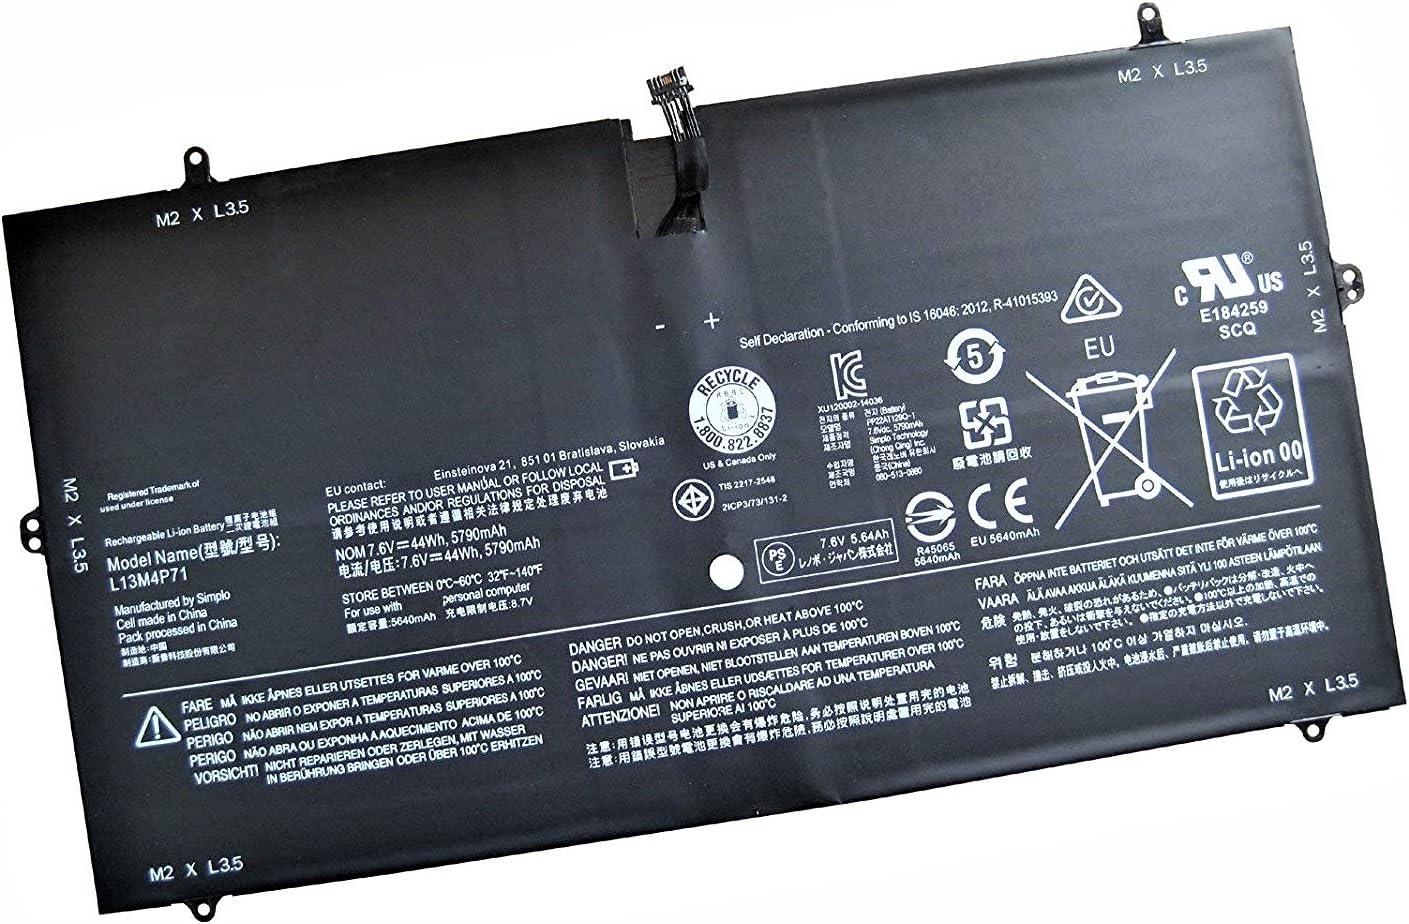 SERNN L13M4P71 Replacement Laptop Battery (7.6V 44WH/5900MAH) for Lenovo Yoga 3 Pro 1370 Series Laptop